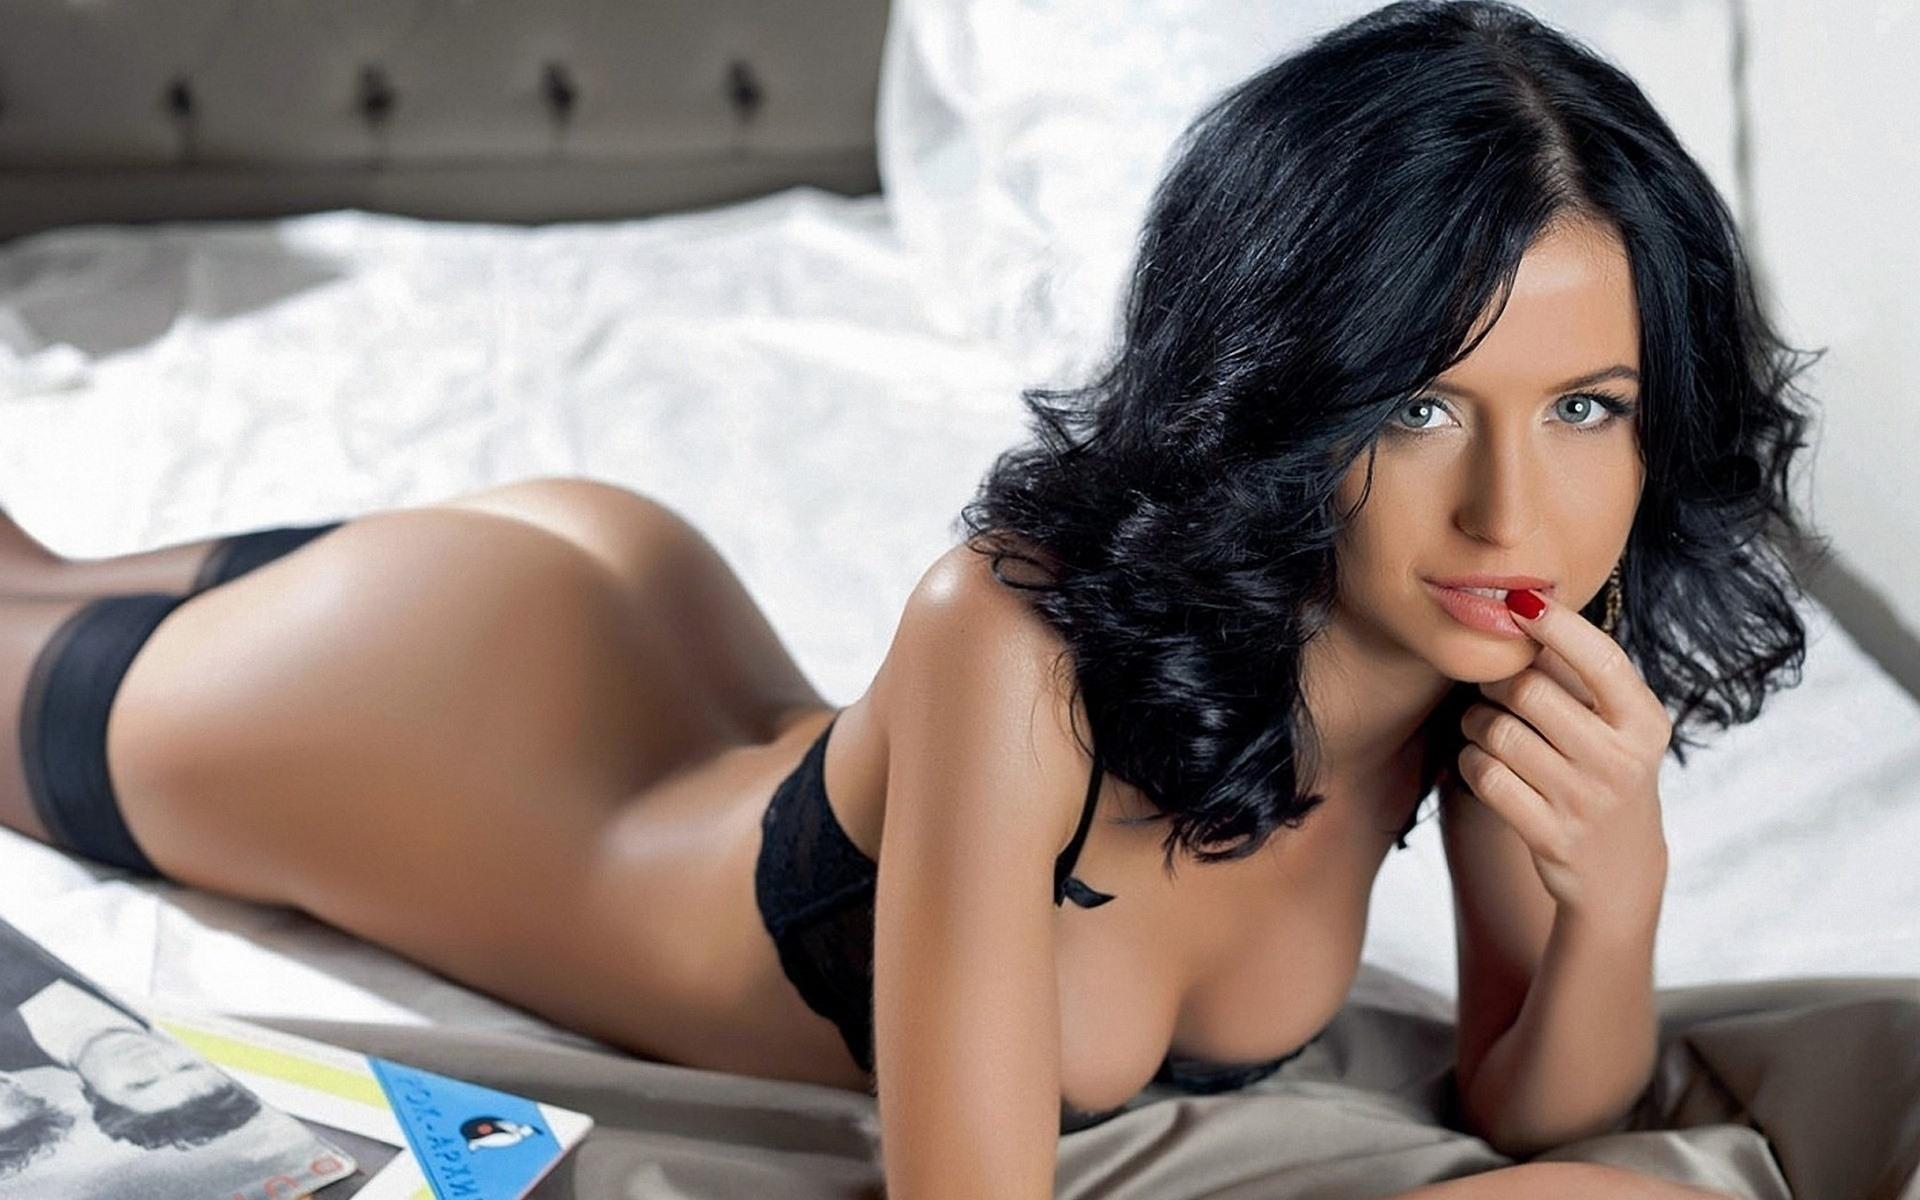 Latest nude of russia erotic photos hq